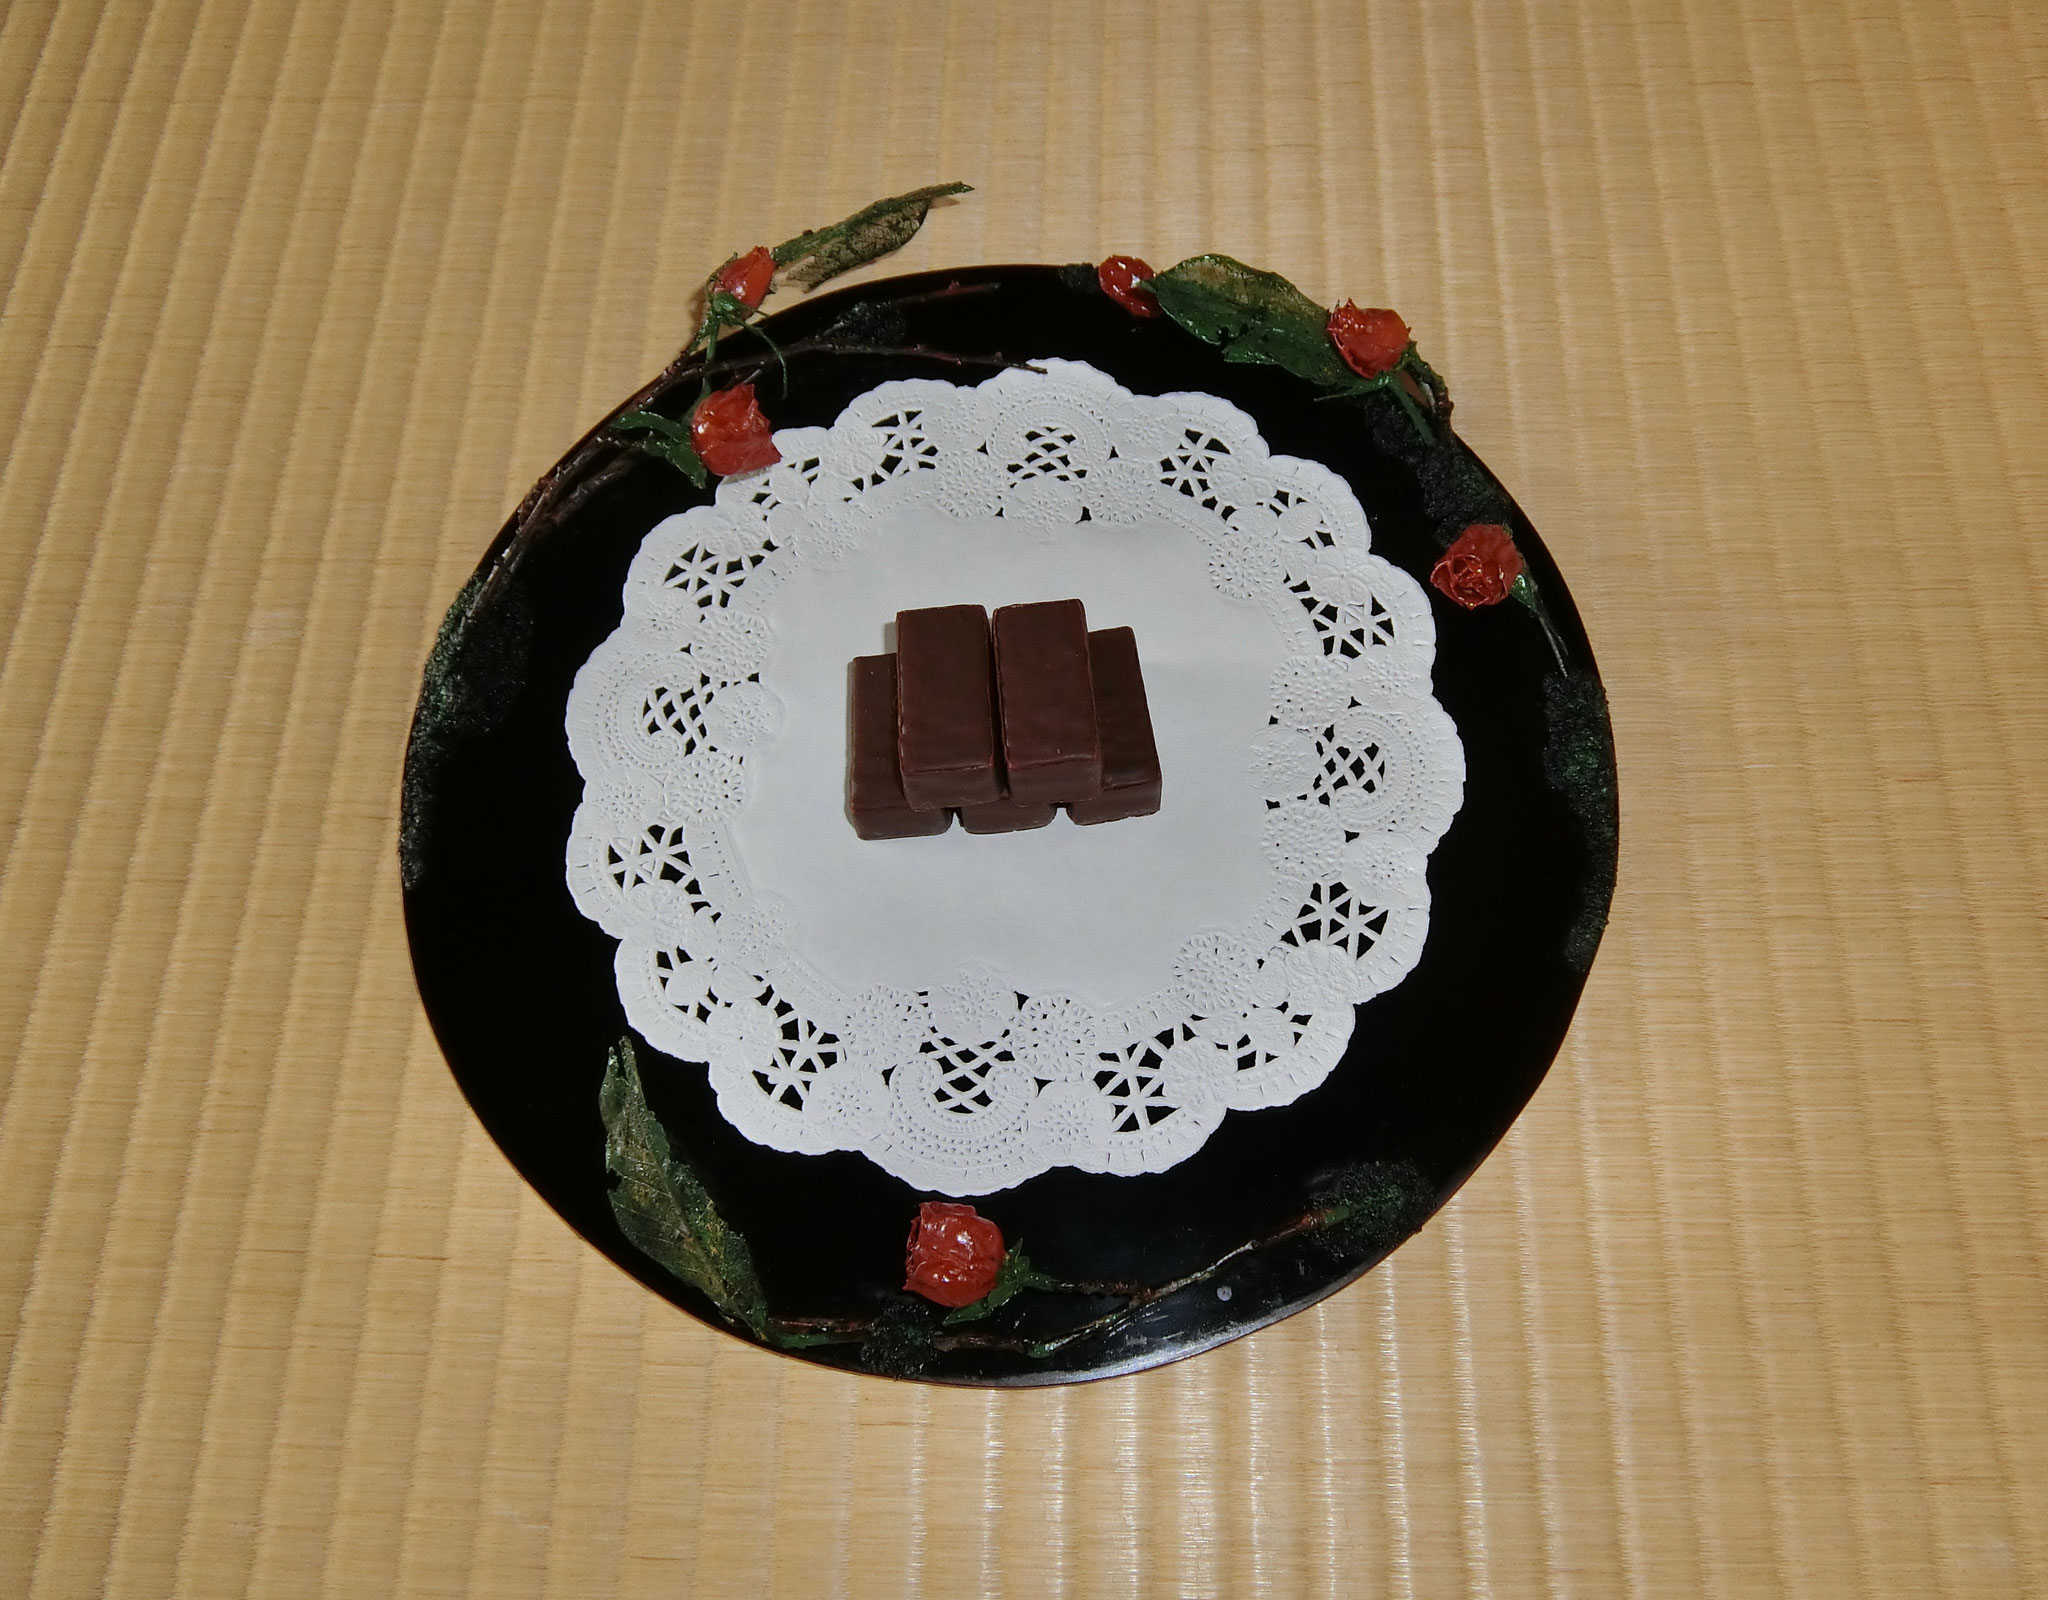 薔薇囲い真塗り干菓子器 林体雅作